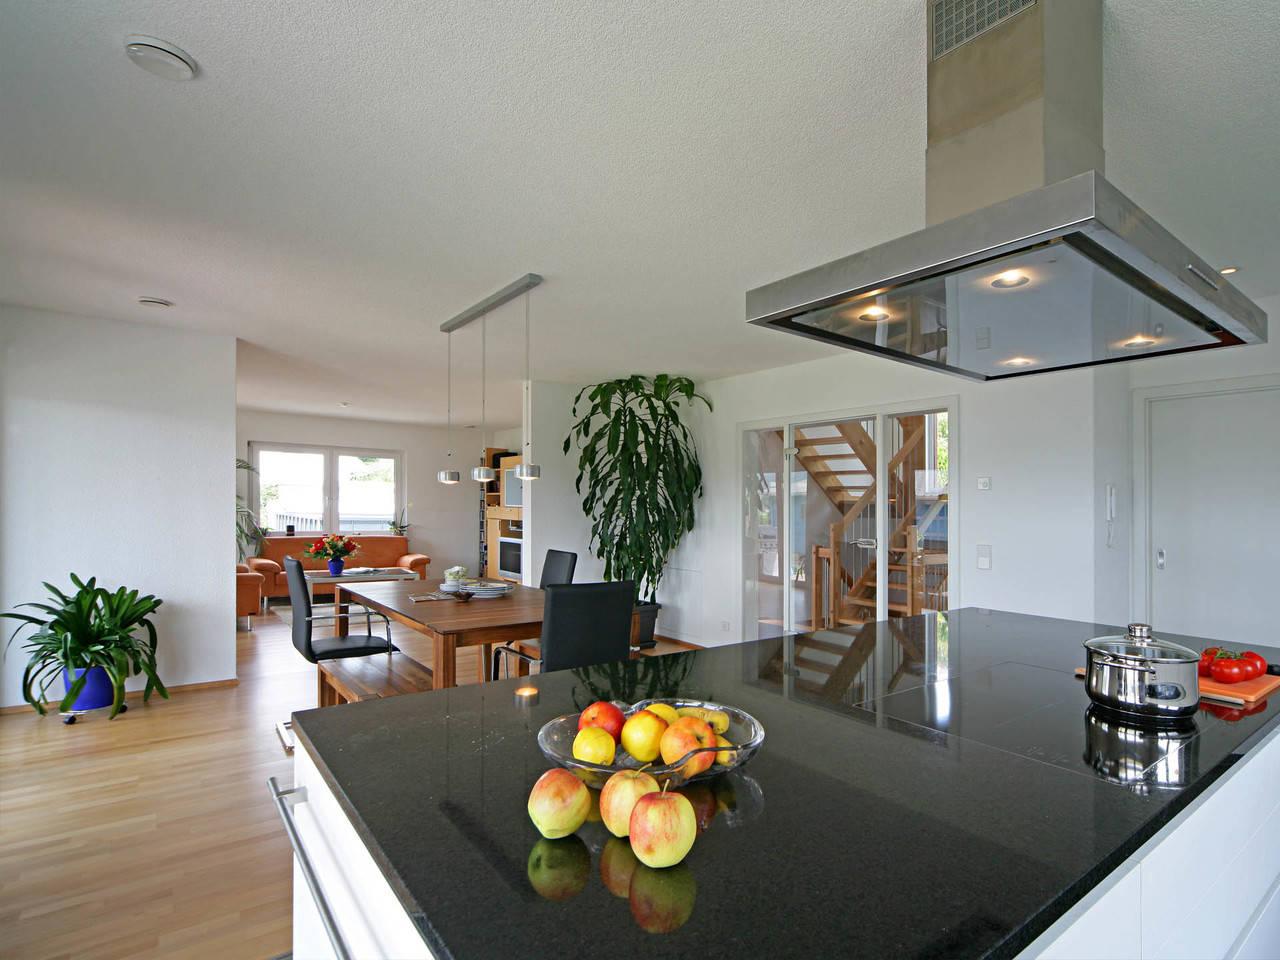 Haus Munk Küche Fertighaus Weiss